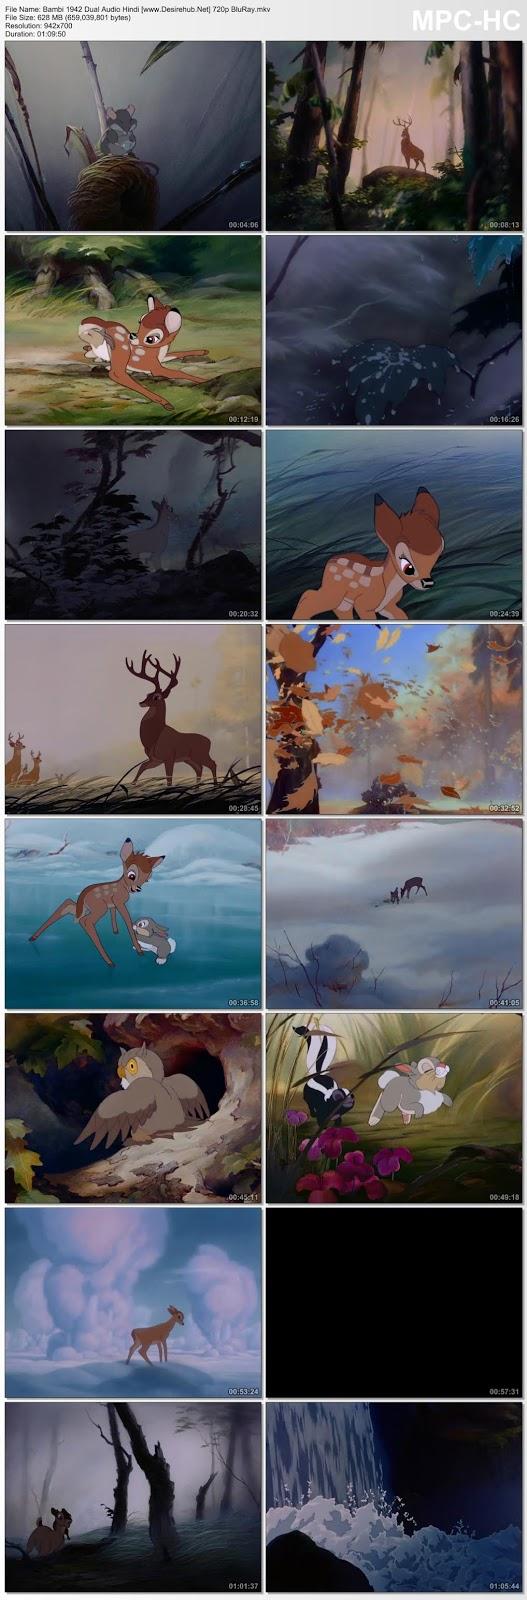 Bambi 1942 Dual Audio Hindi 720p BluRay 600MB Desirehub